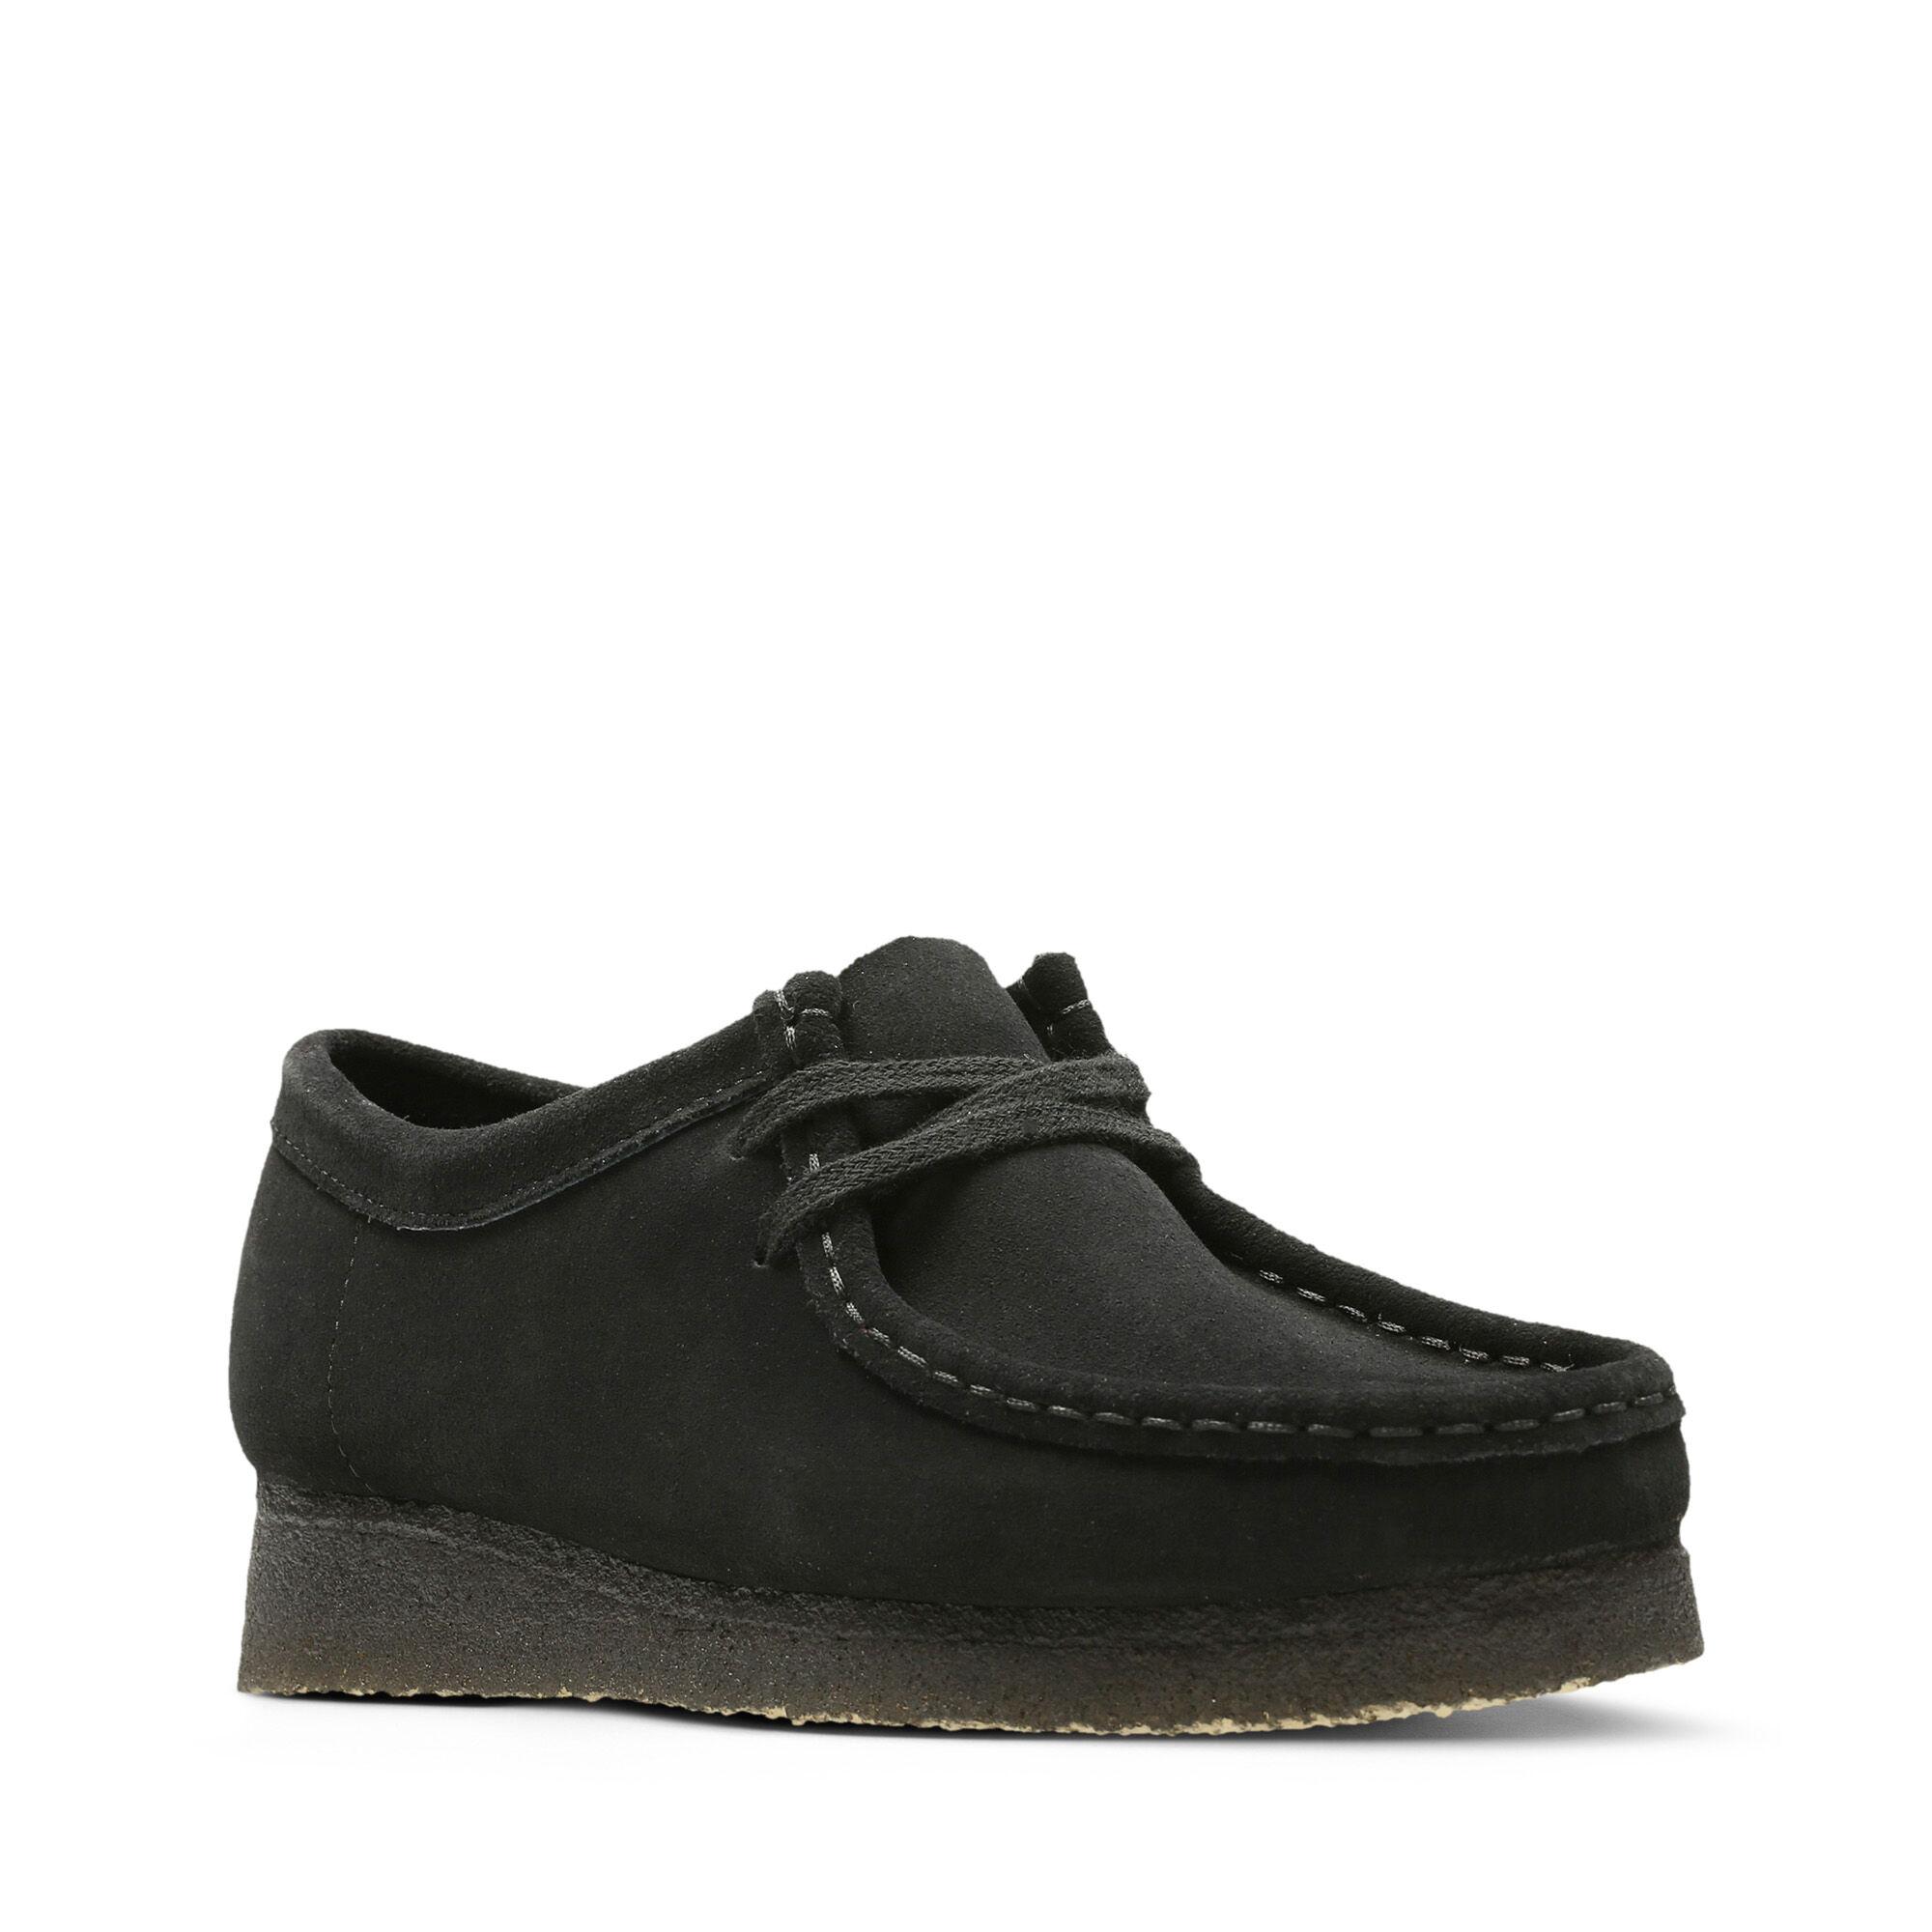 Women's Black Suede Shoes Wallabee | Clarks